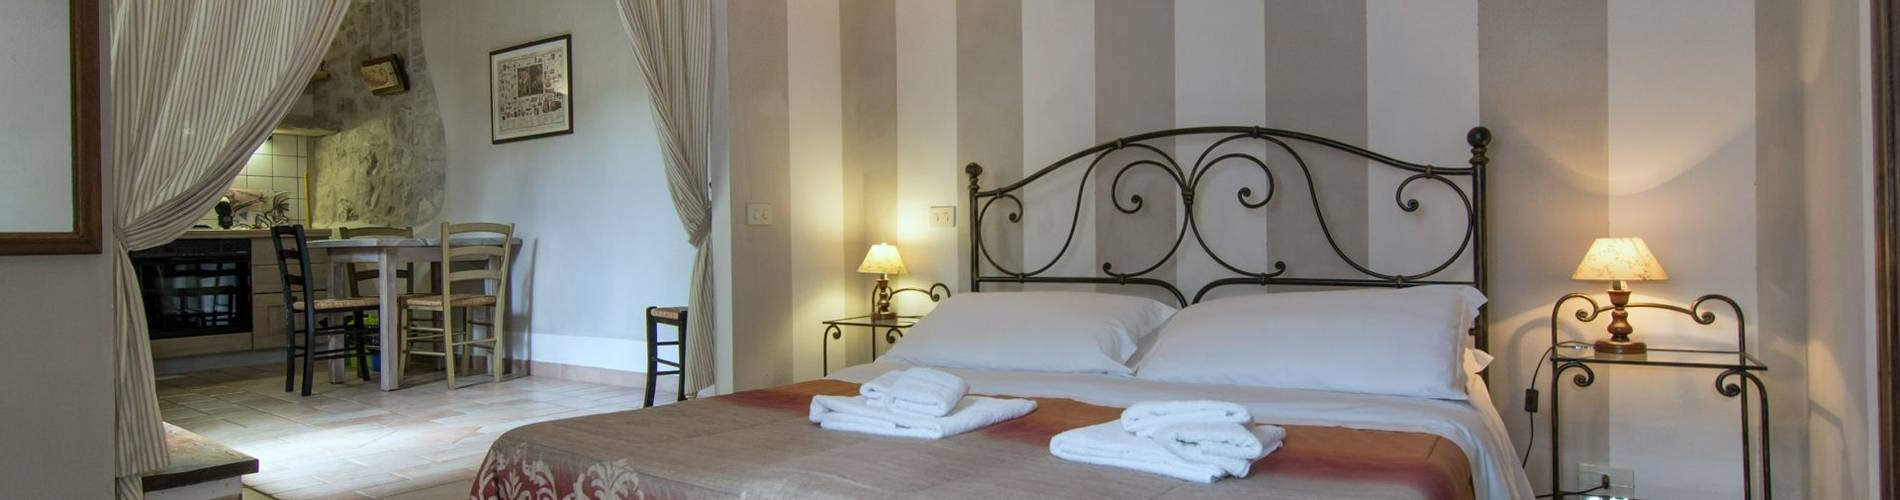 Montemenardo, Umbria, Italy, Il Pozzo Room (3).jpg